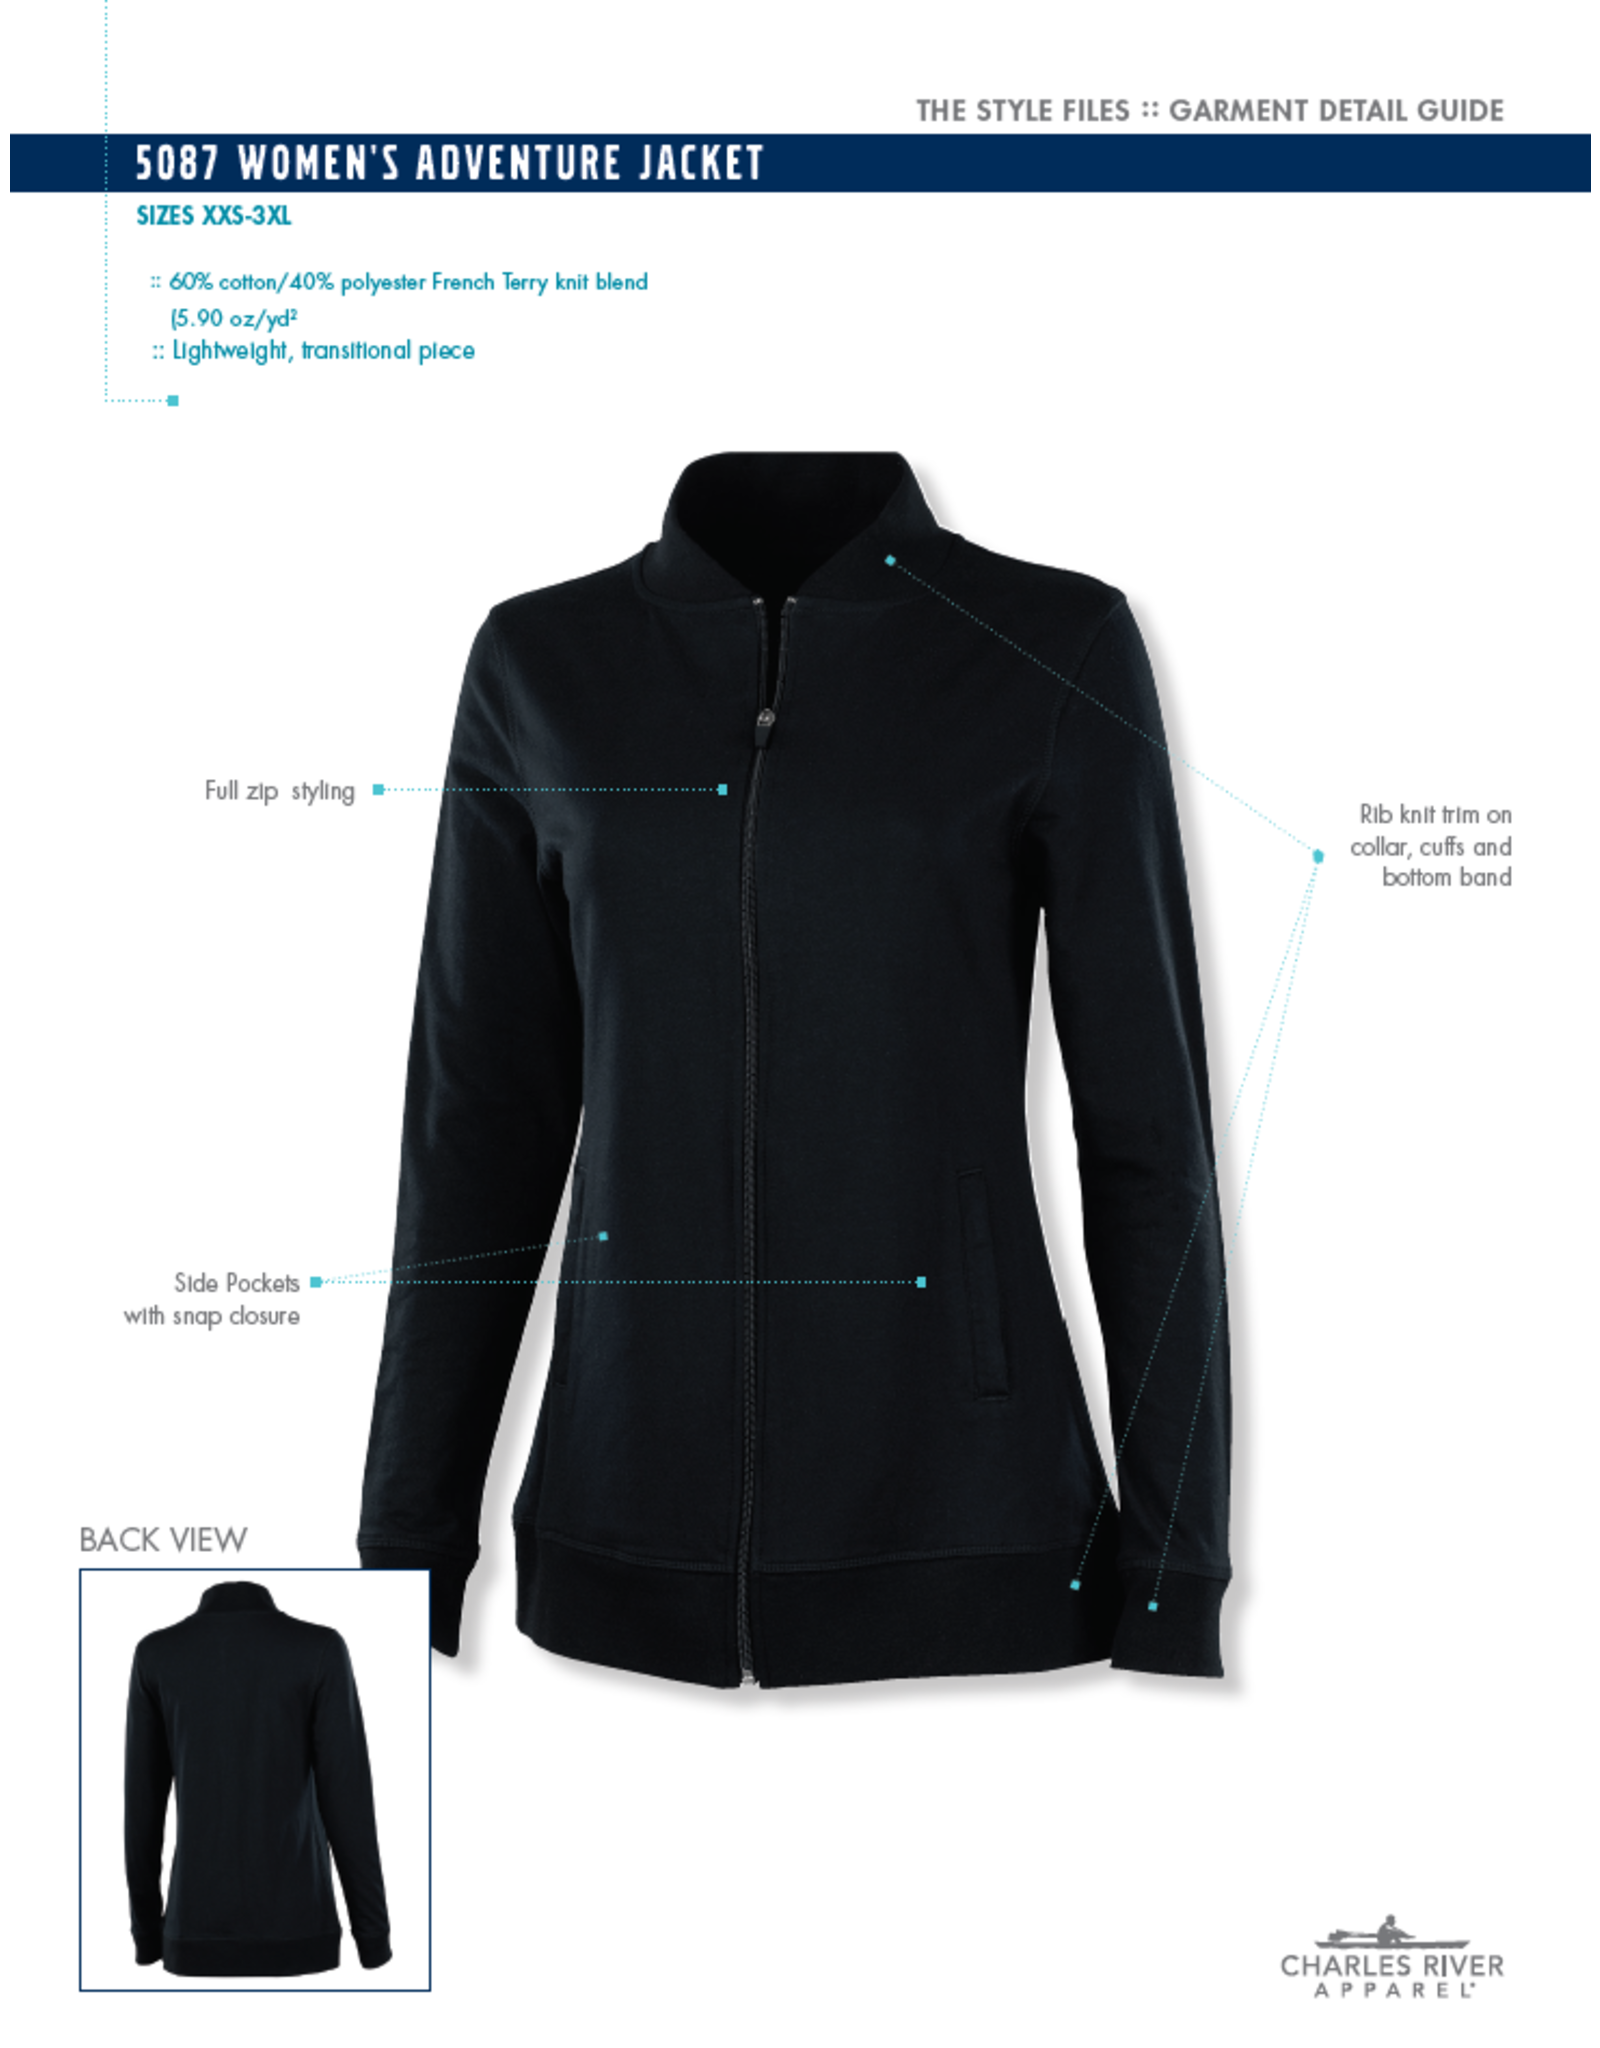 NON-UNIFORM Women's Adventure Jacket, Custom Order